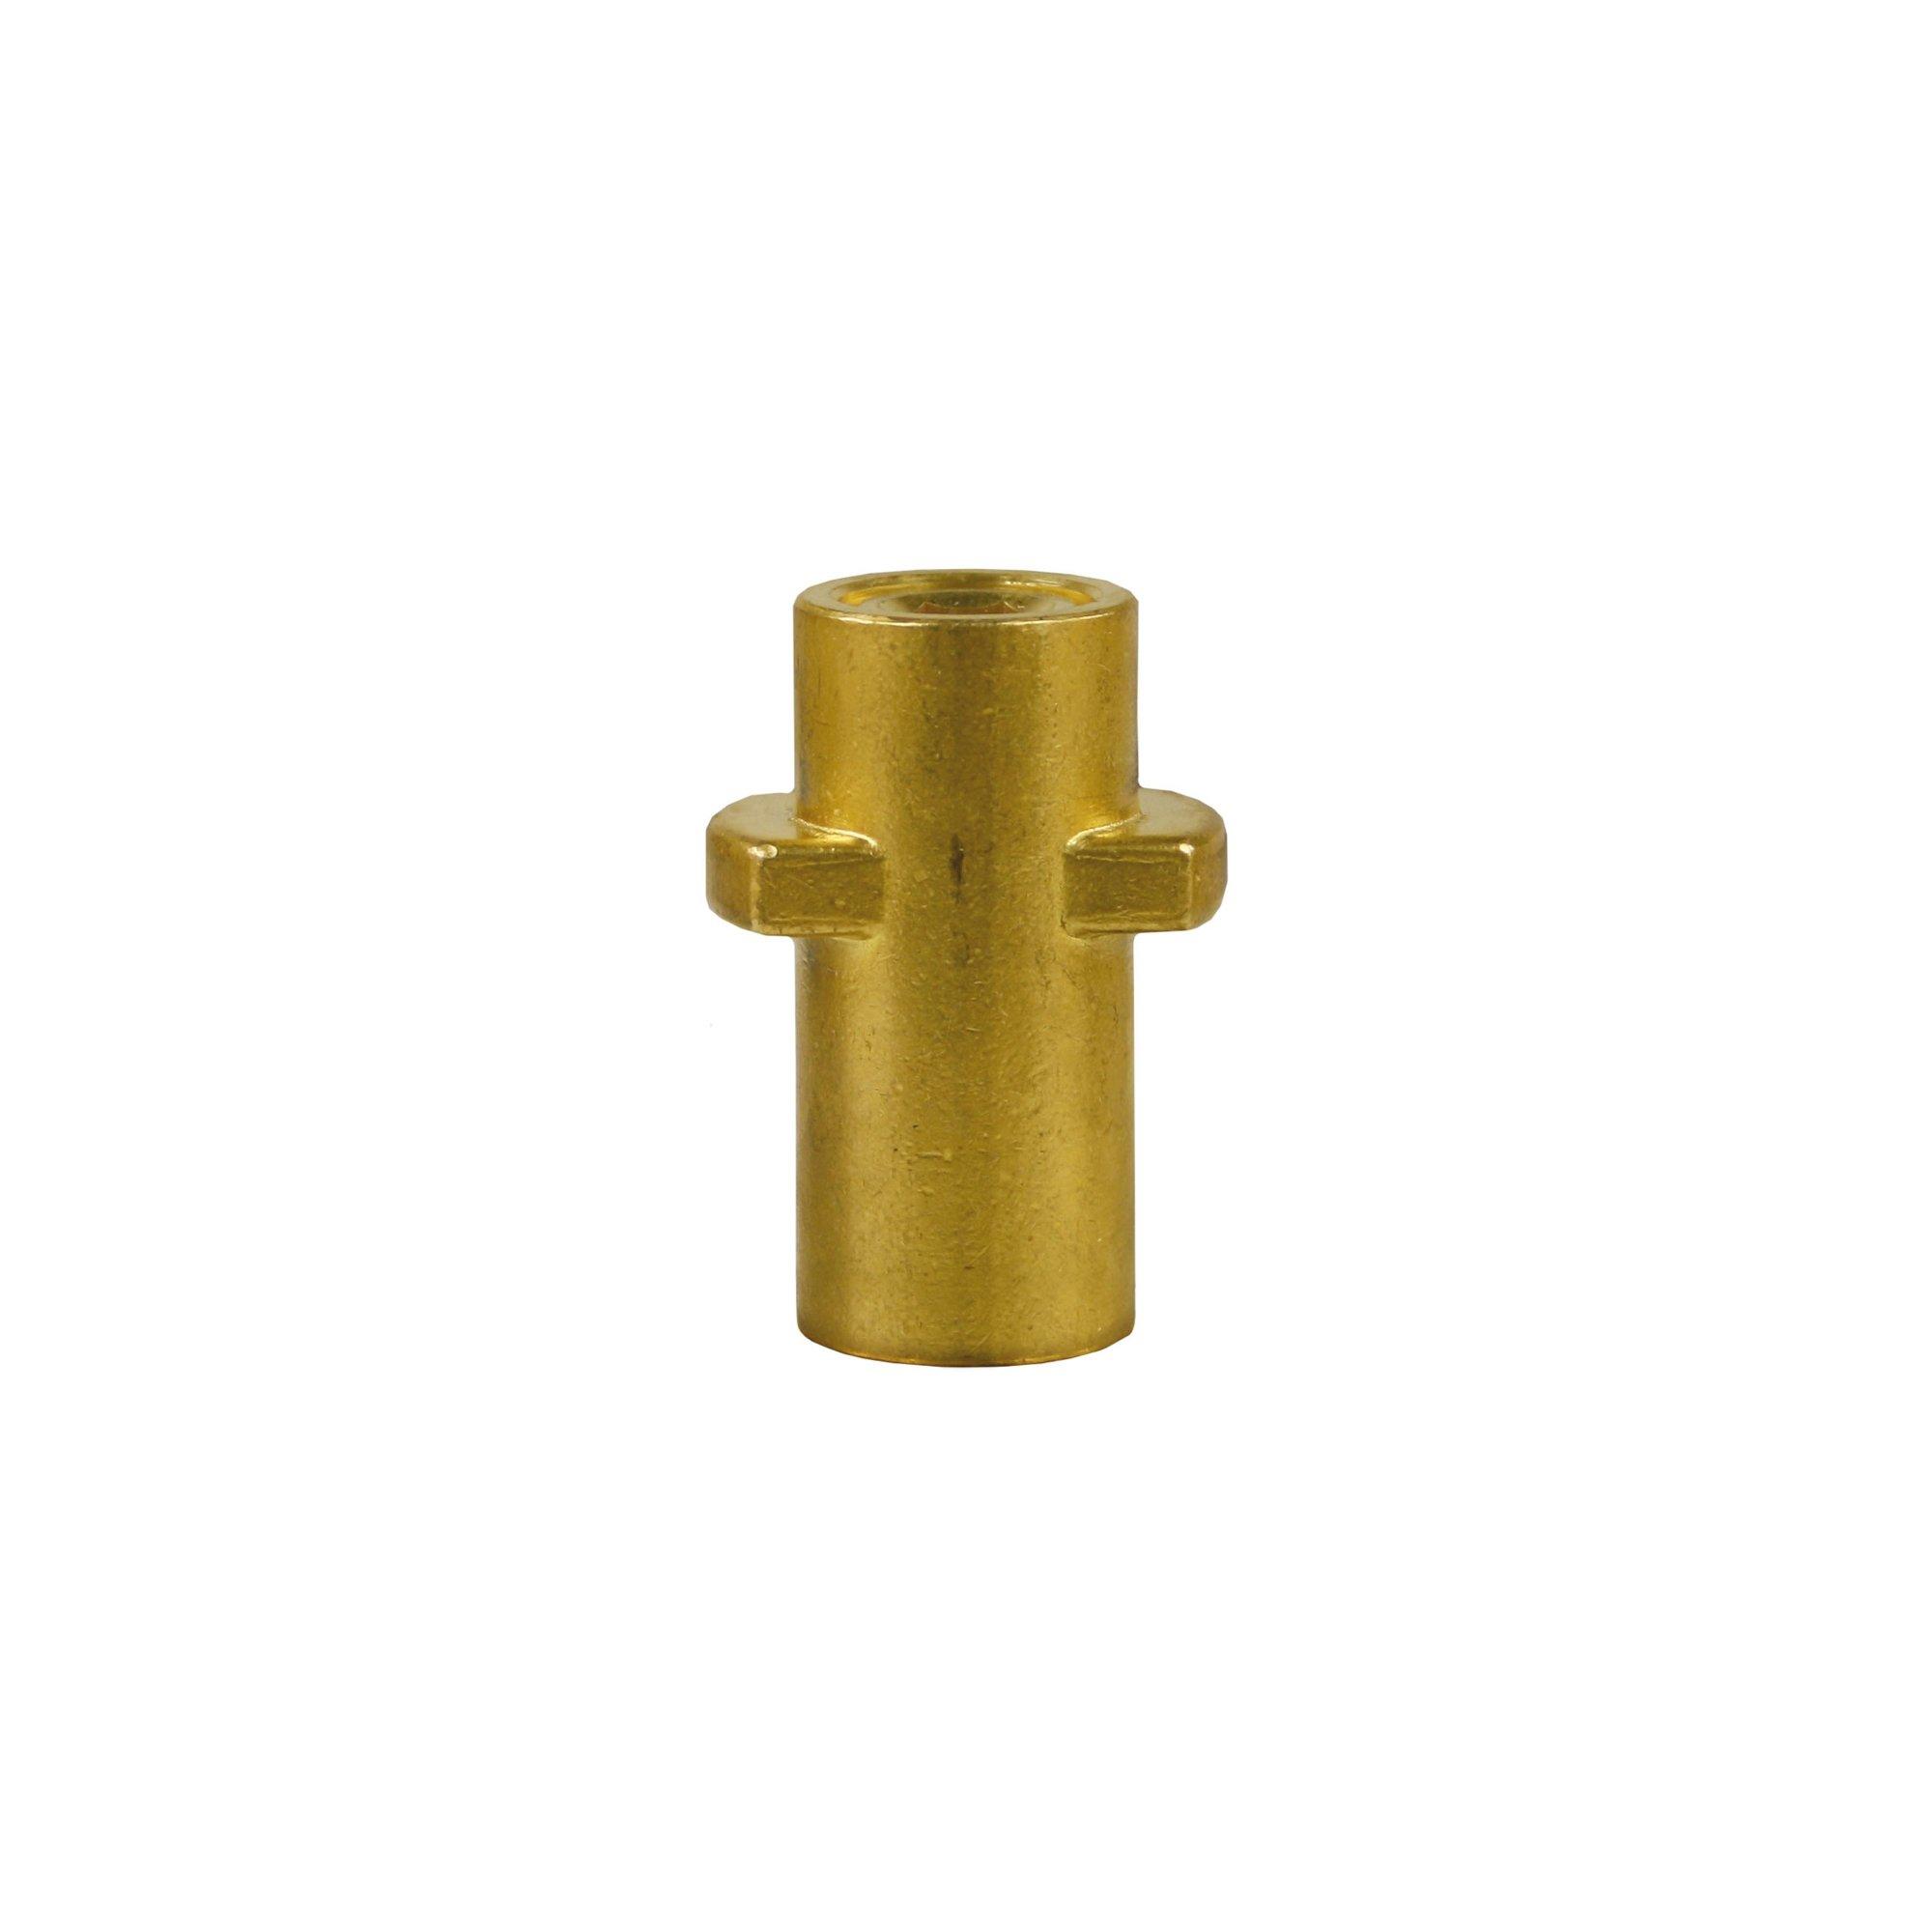 Suttner Adapter Bajonett K Stecker ( Kärcher) Adapter IG 1/4 : Bajonett K Messing